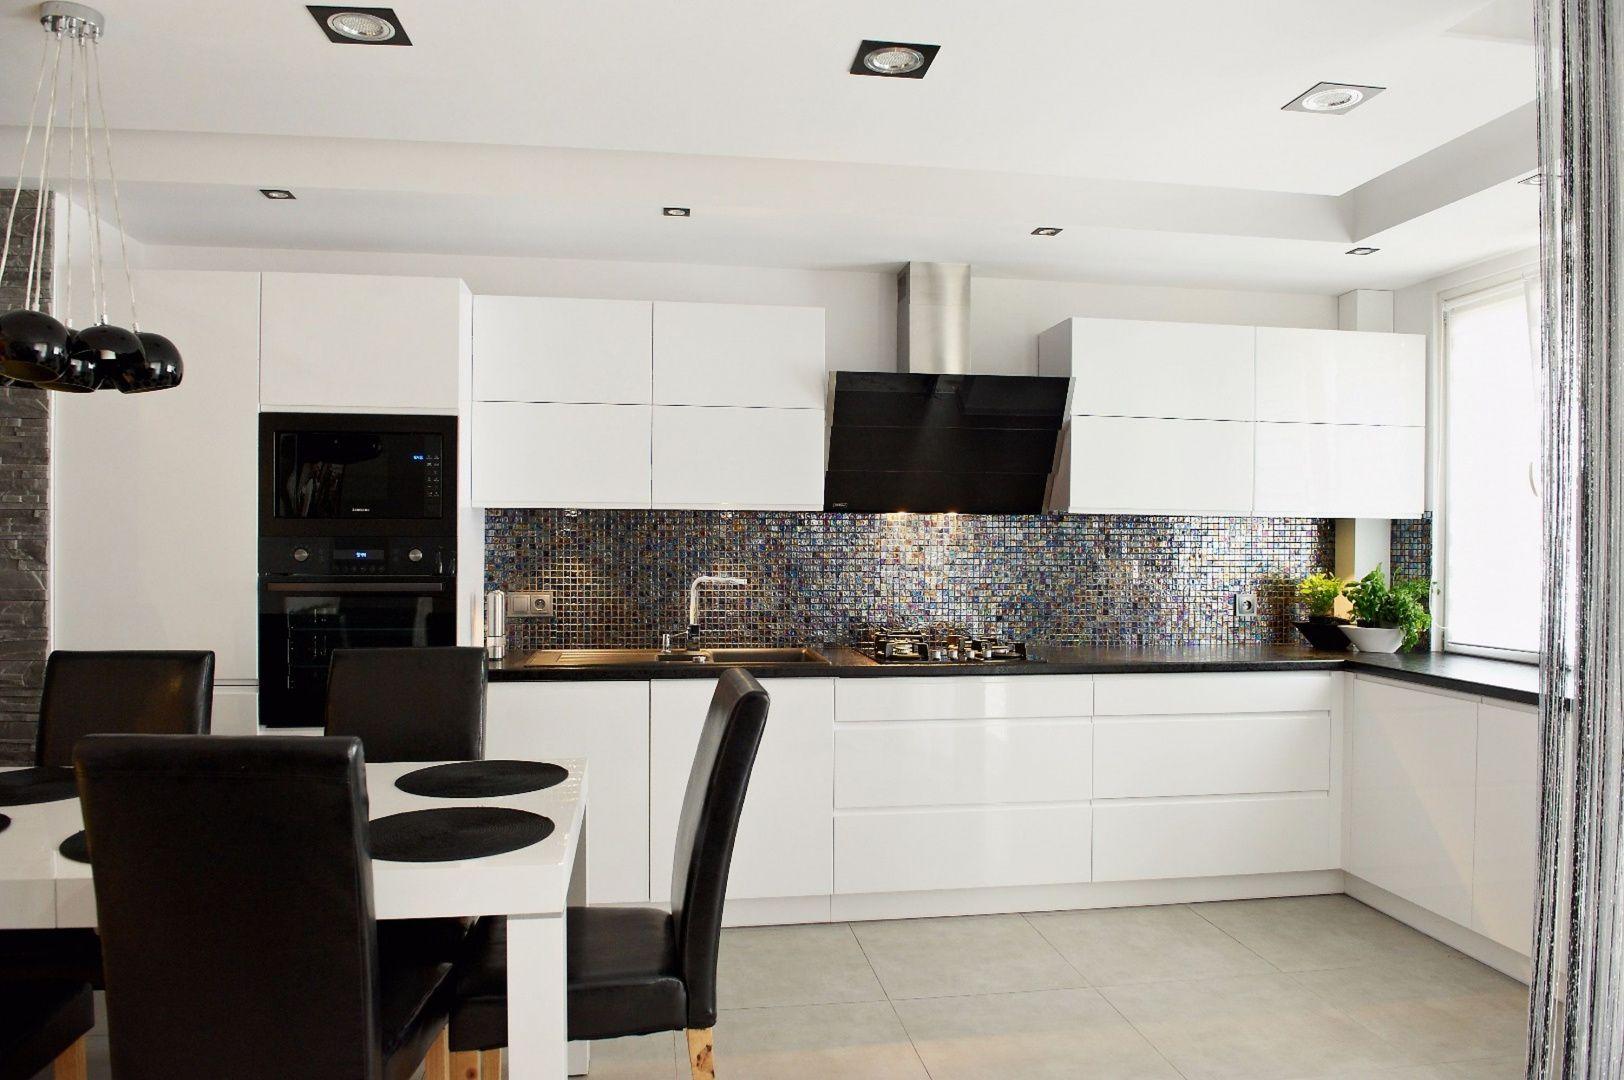 Sciana Nad Blatem Kolorowa Mozaika Studio Meble Vente Max Kuchnie Home Decor Furniture Decor